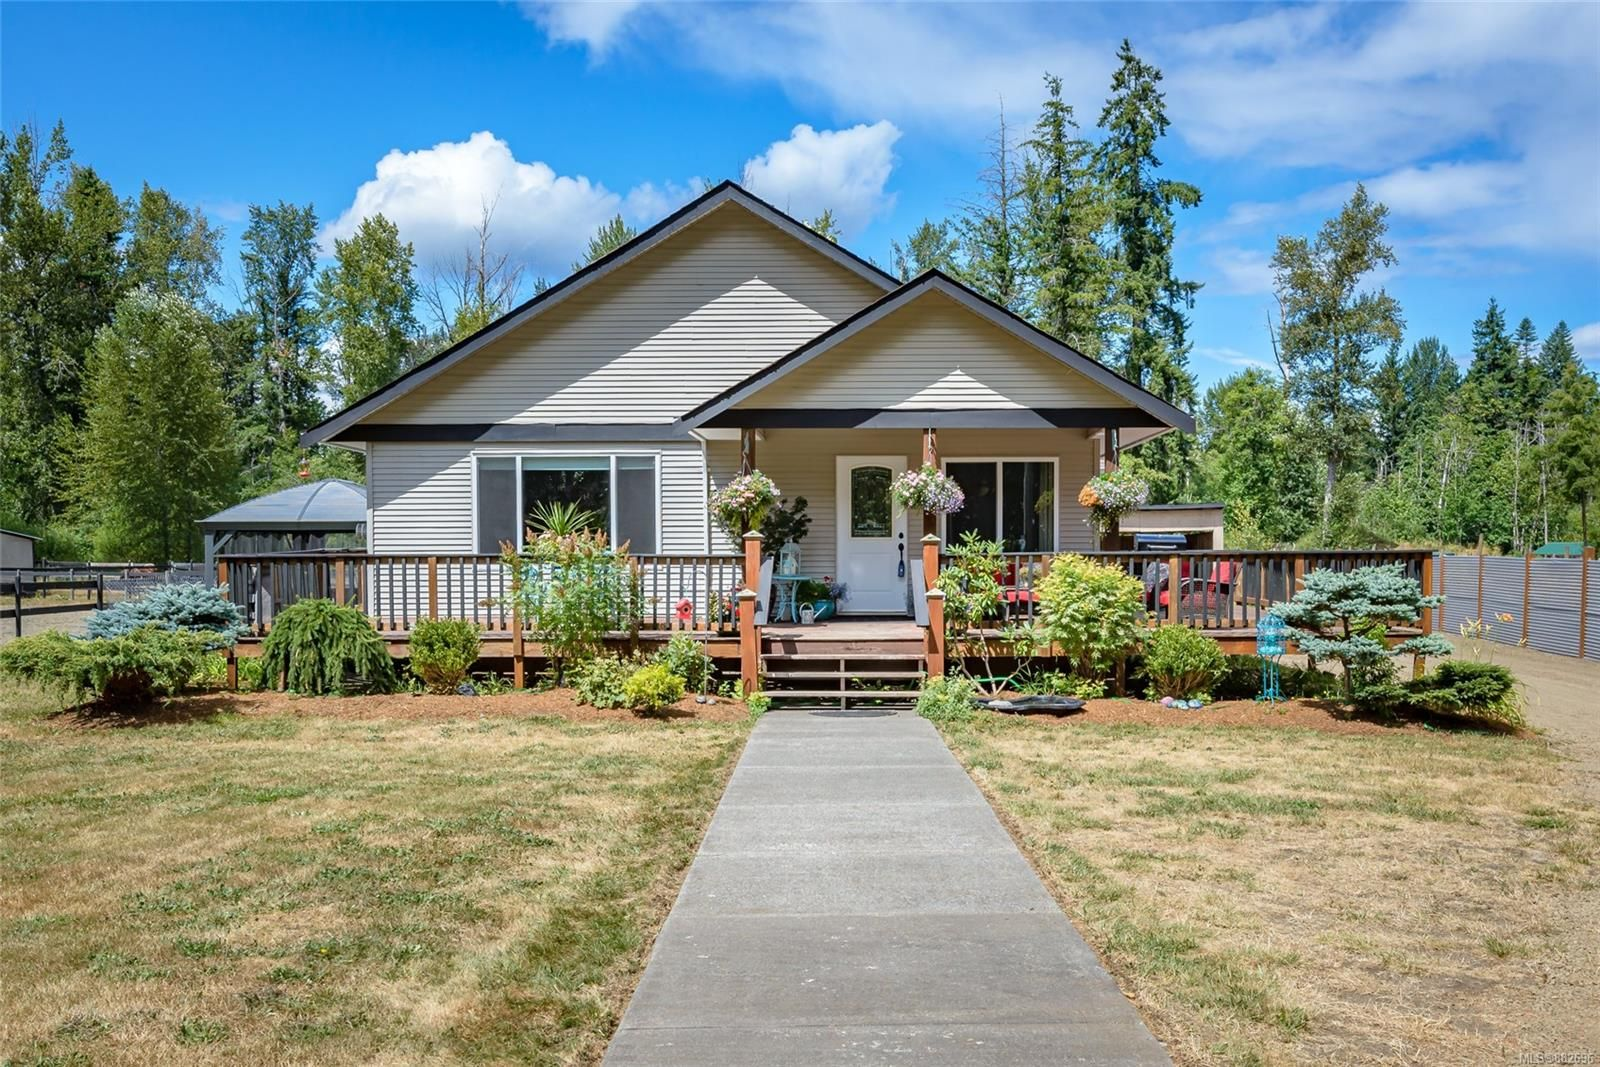 Photo 4: Photos: 3554 MacAulay Rd in : CV Merville Black Creek House for sale (Comox Valley)  : MLS®# 882696